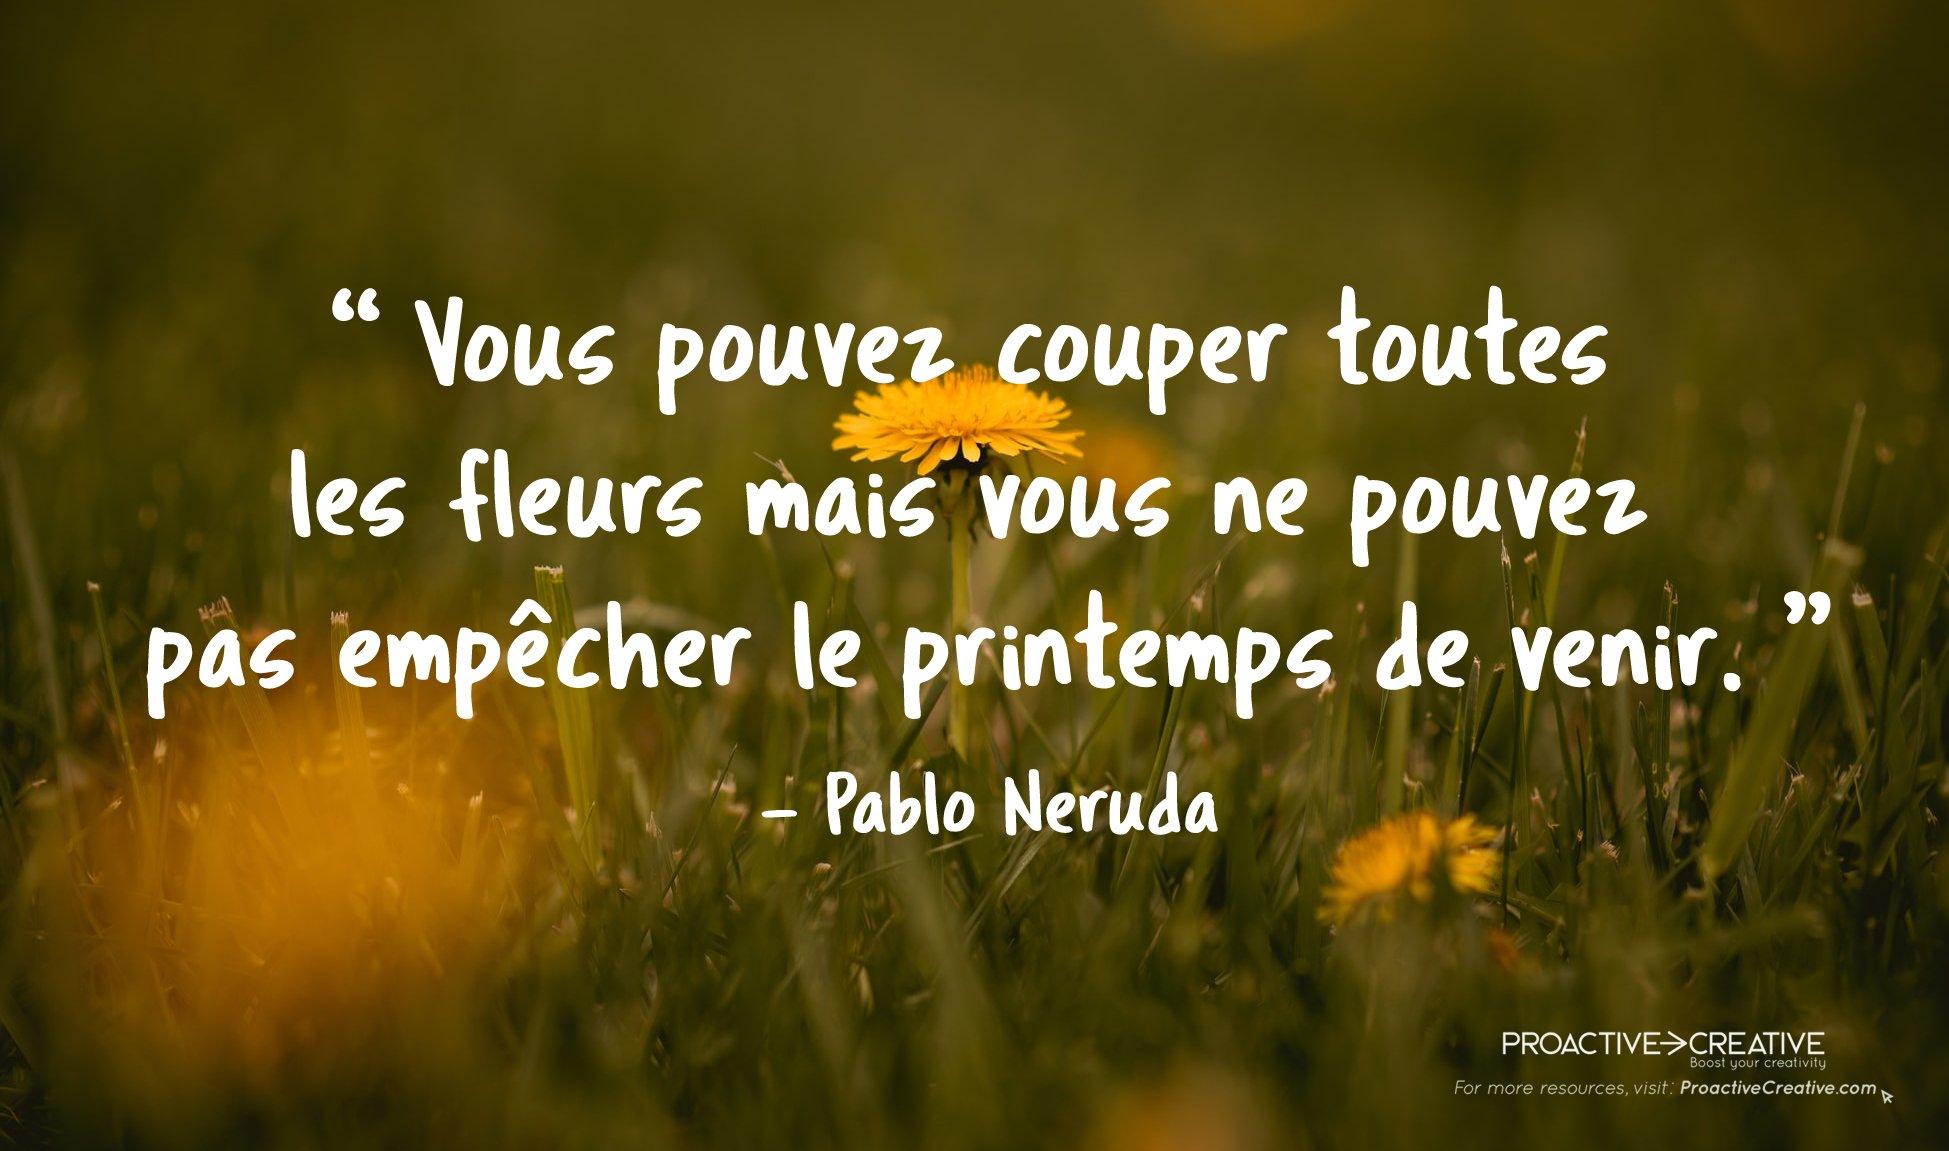 Citations positives - Pablo Neruda